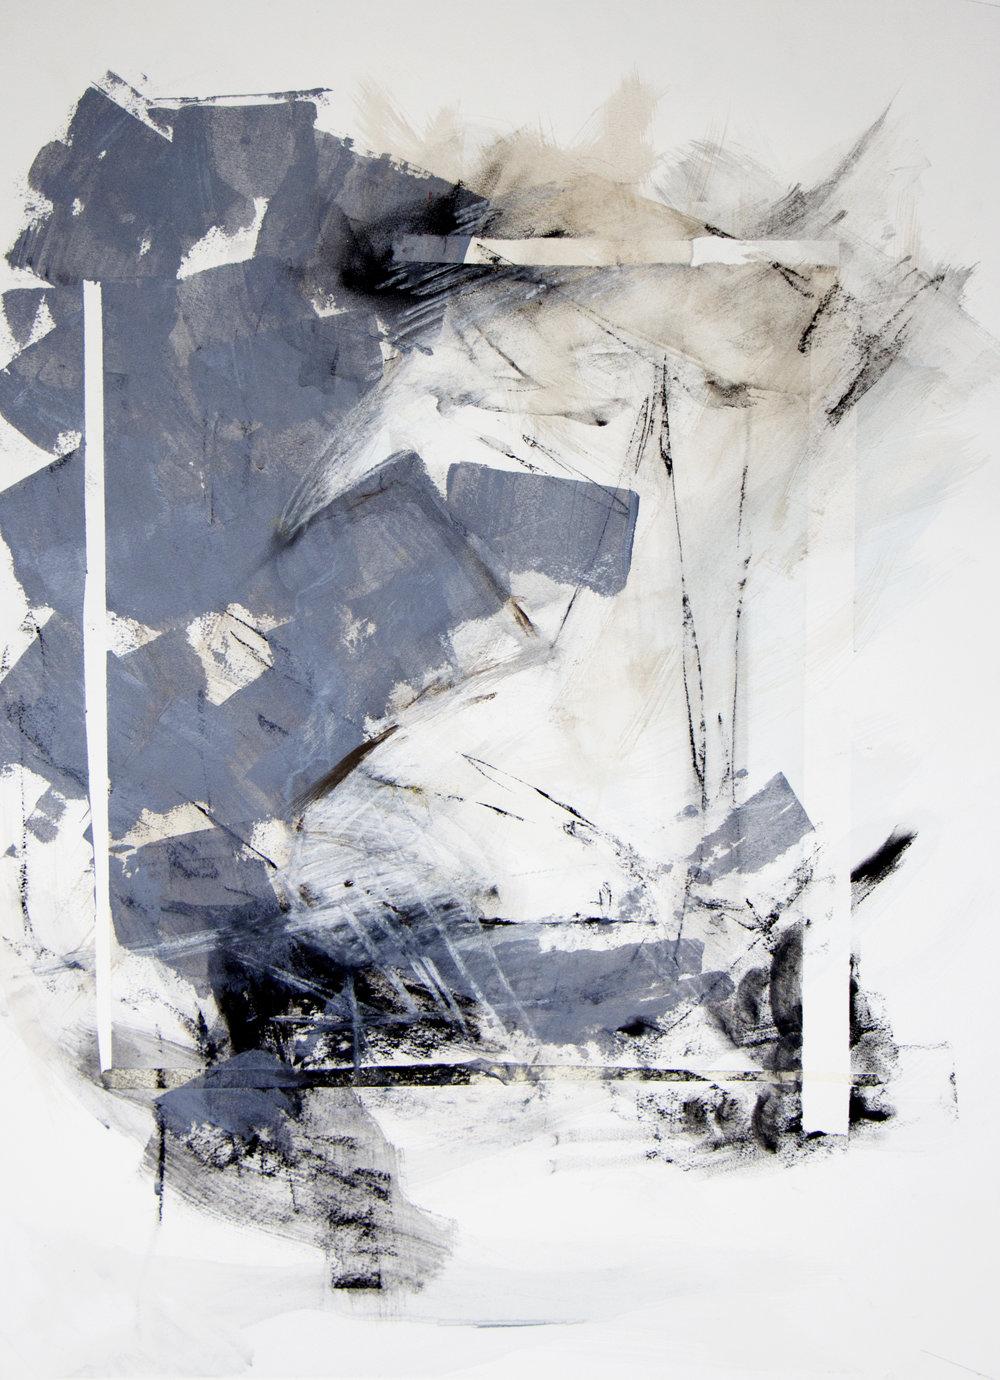 Untitled, $300